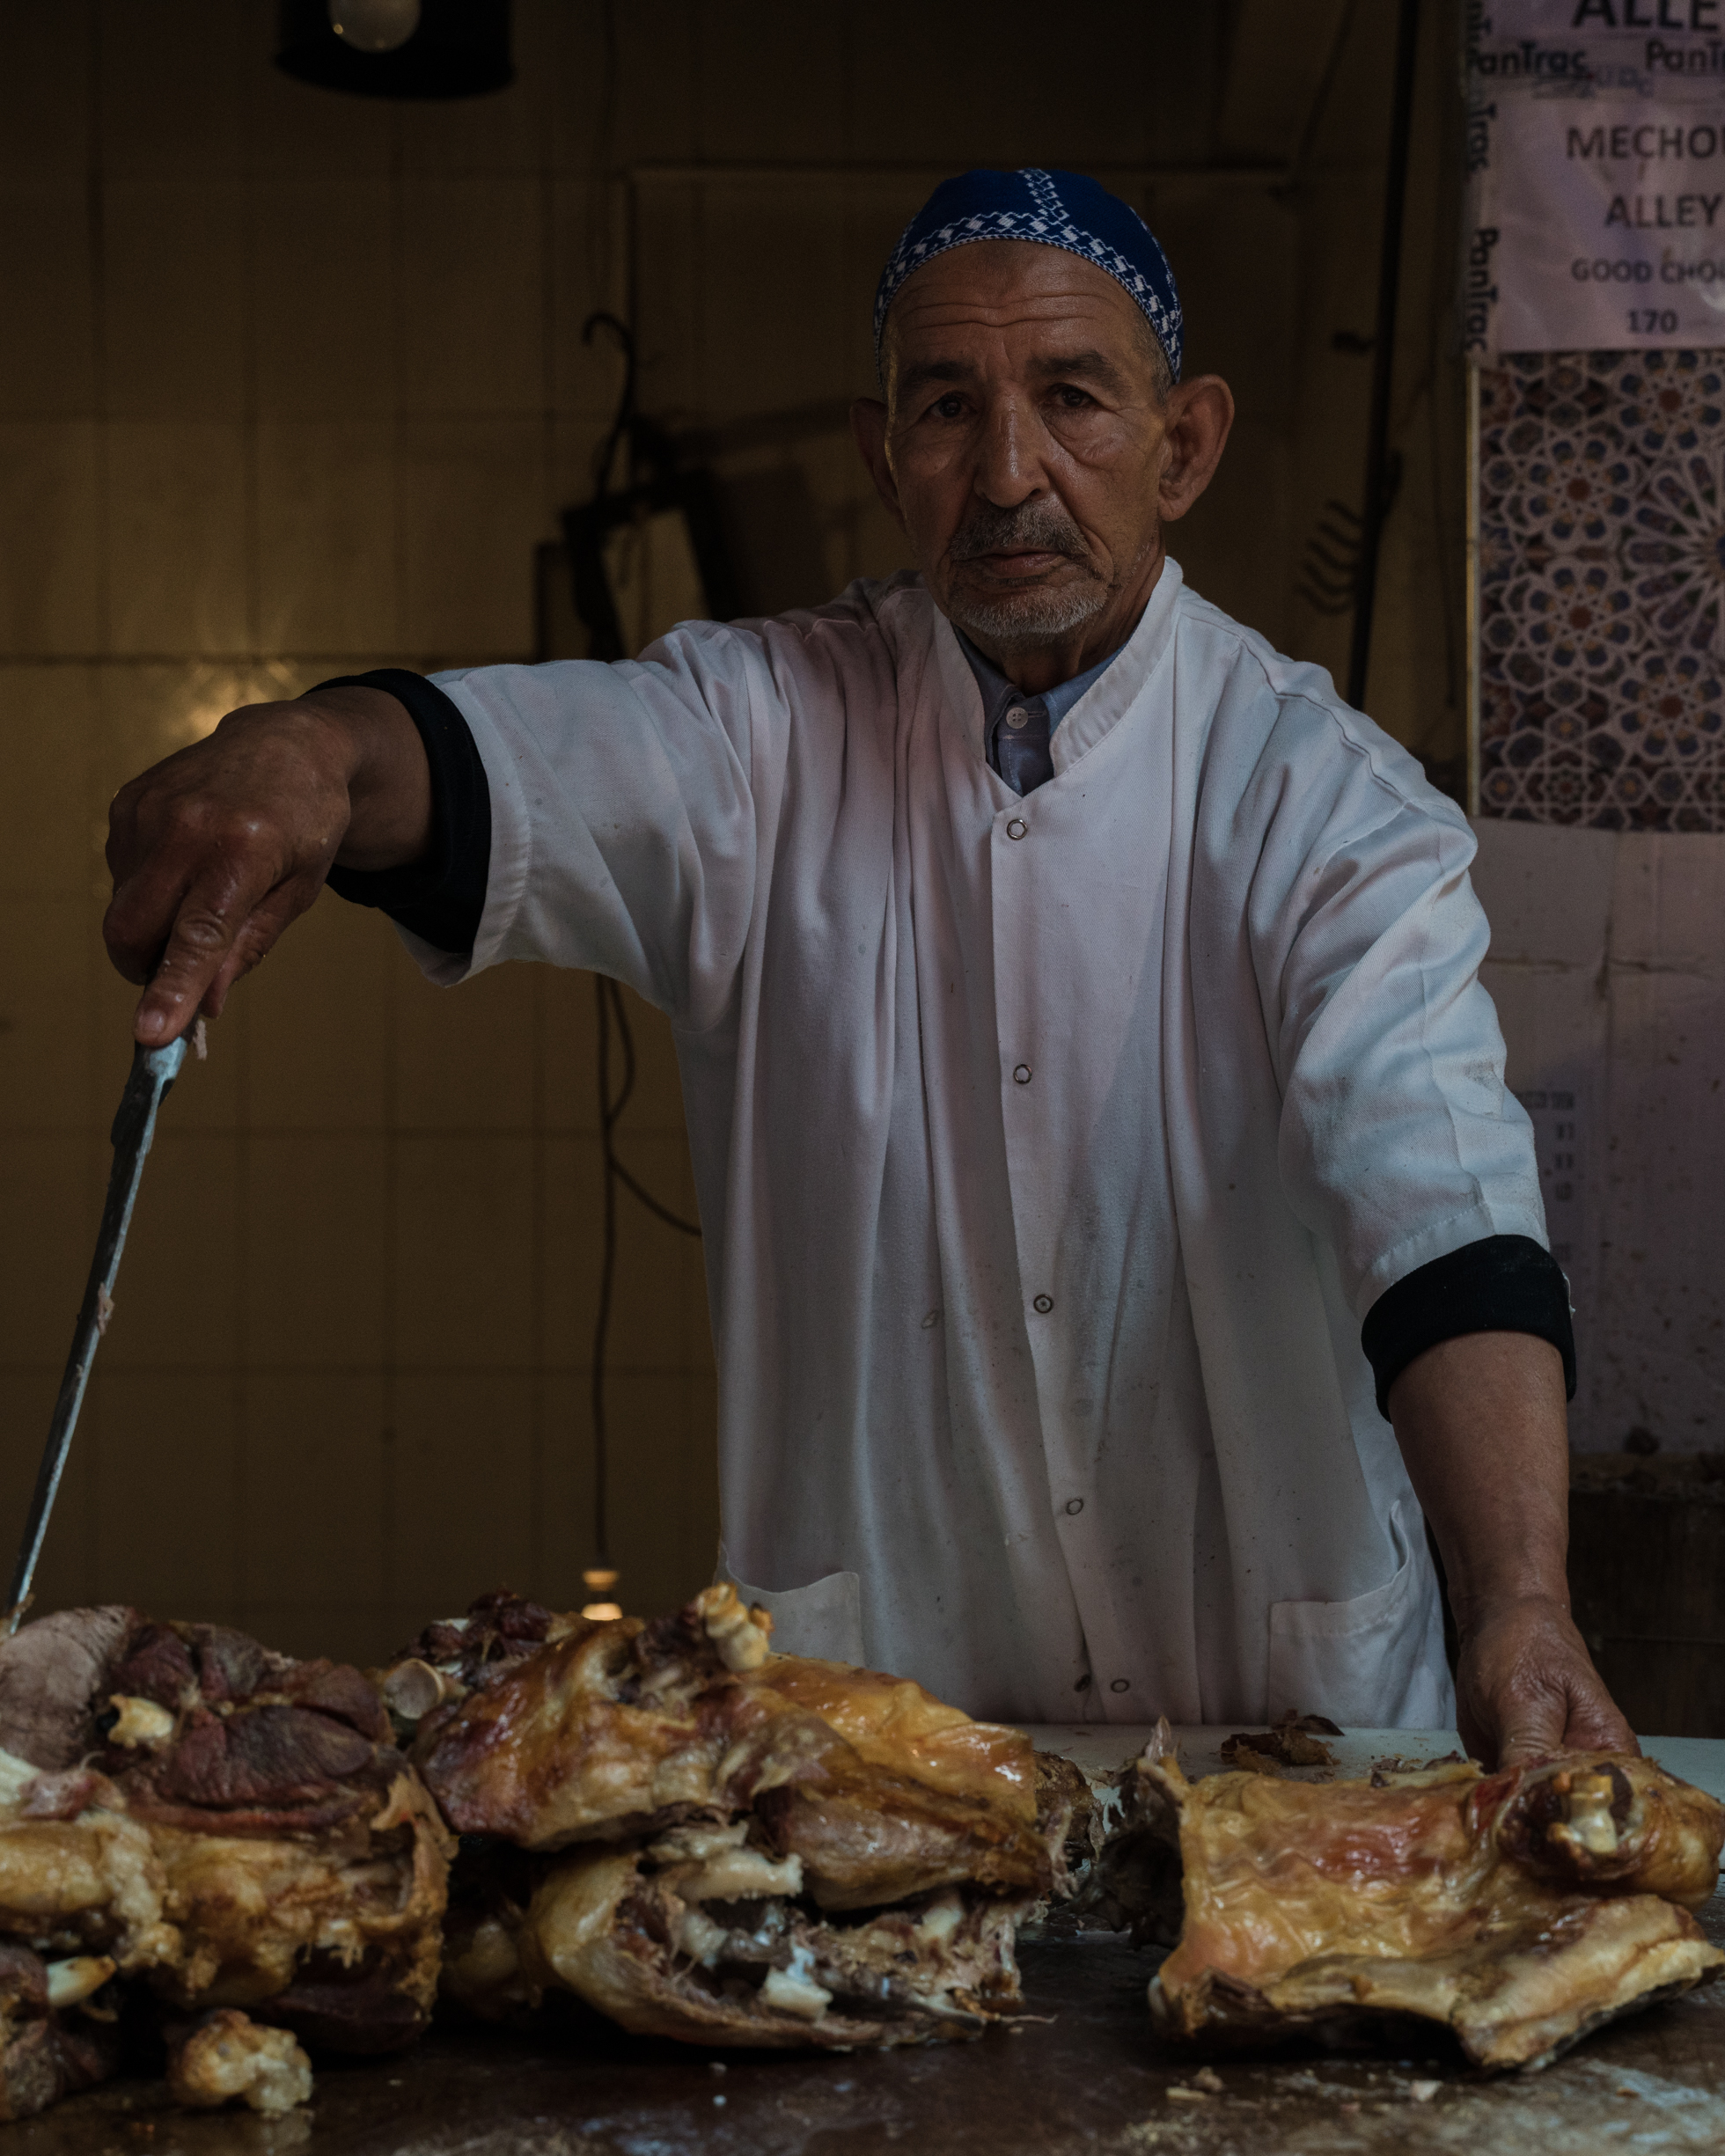 The Medina - Morocco